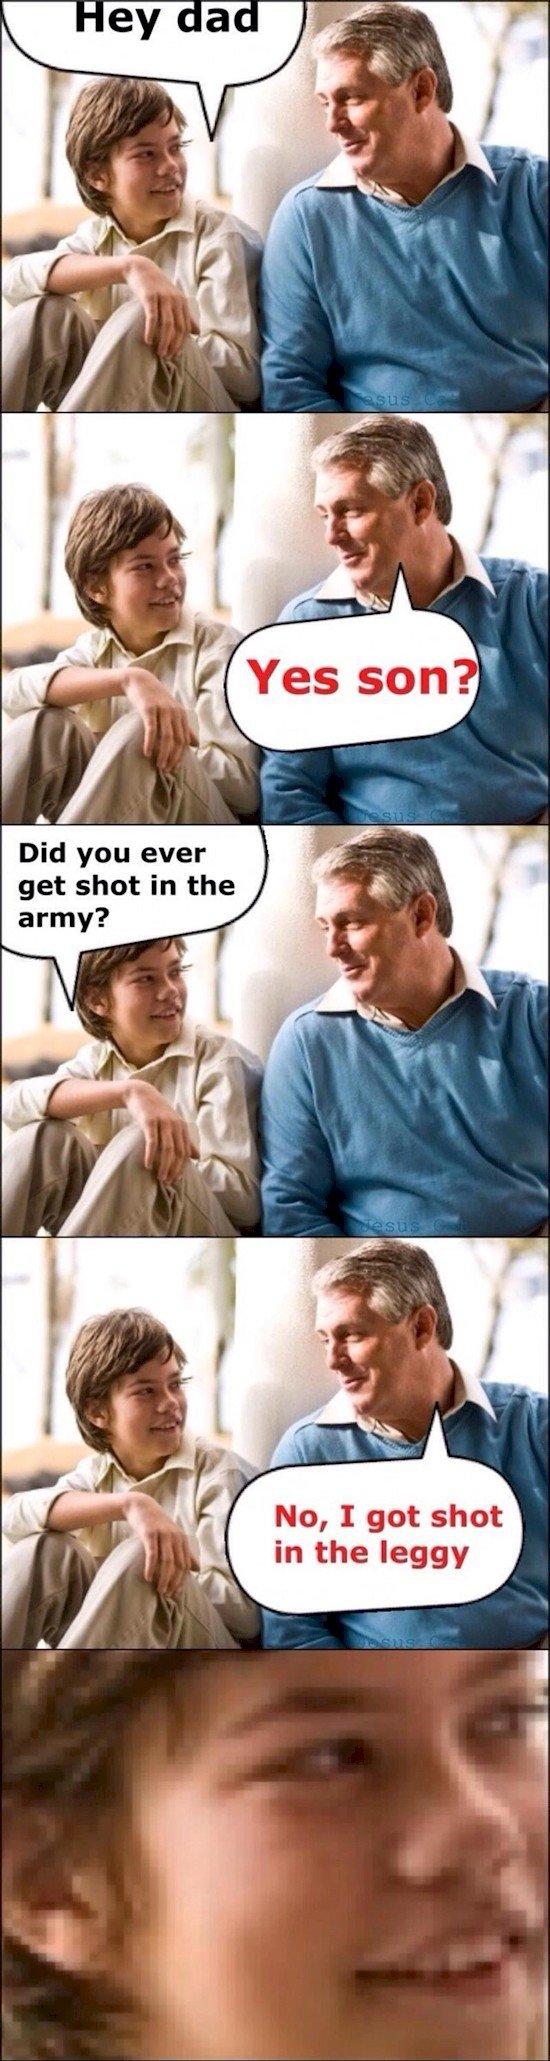 Best Very Funny Jokes